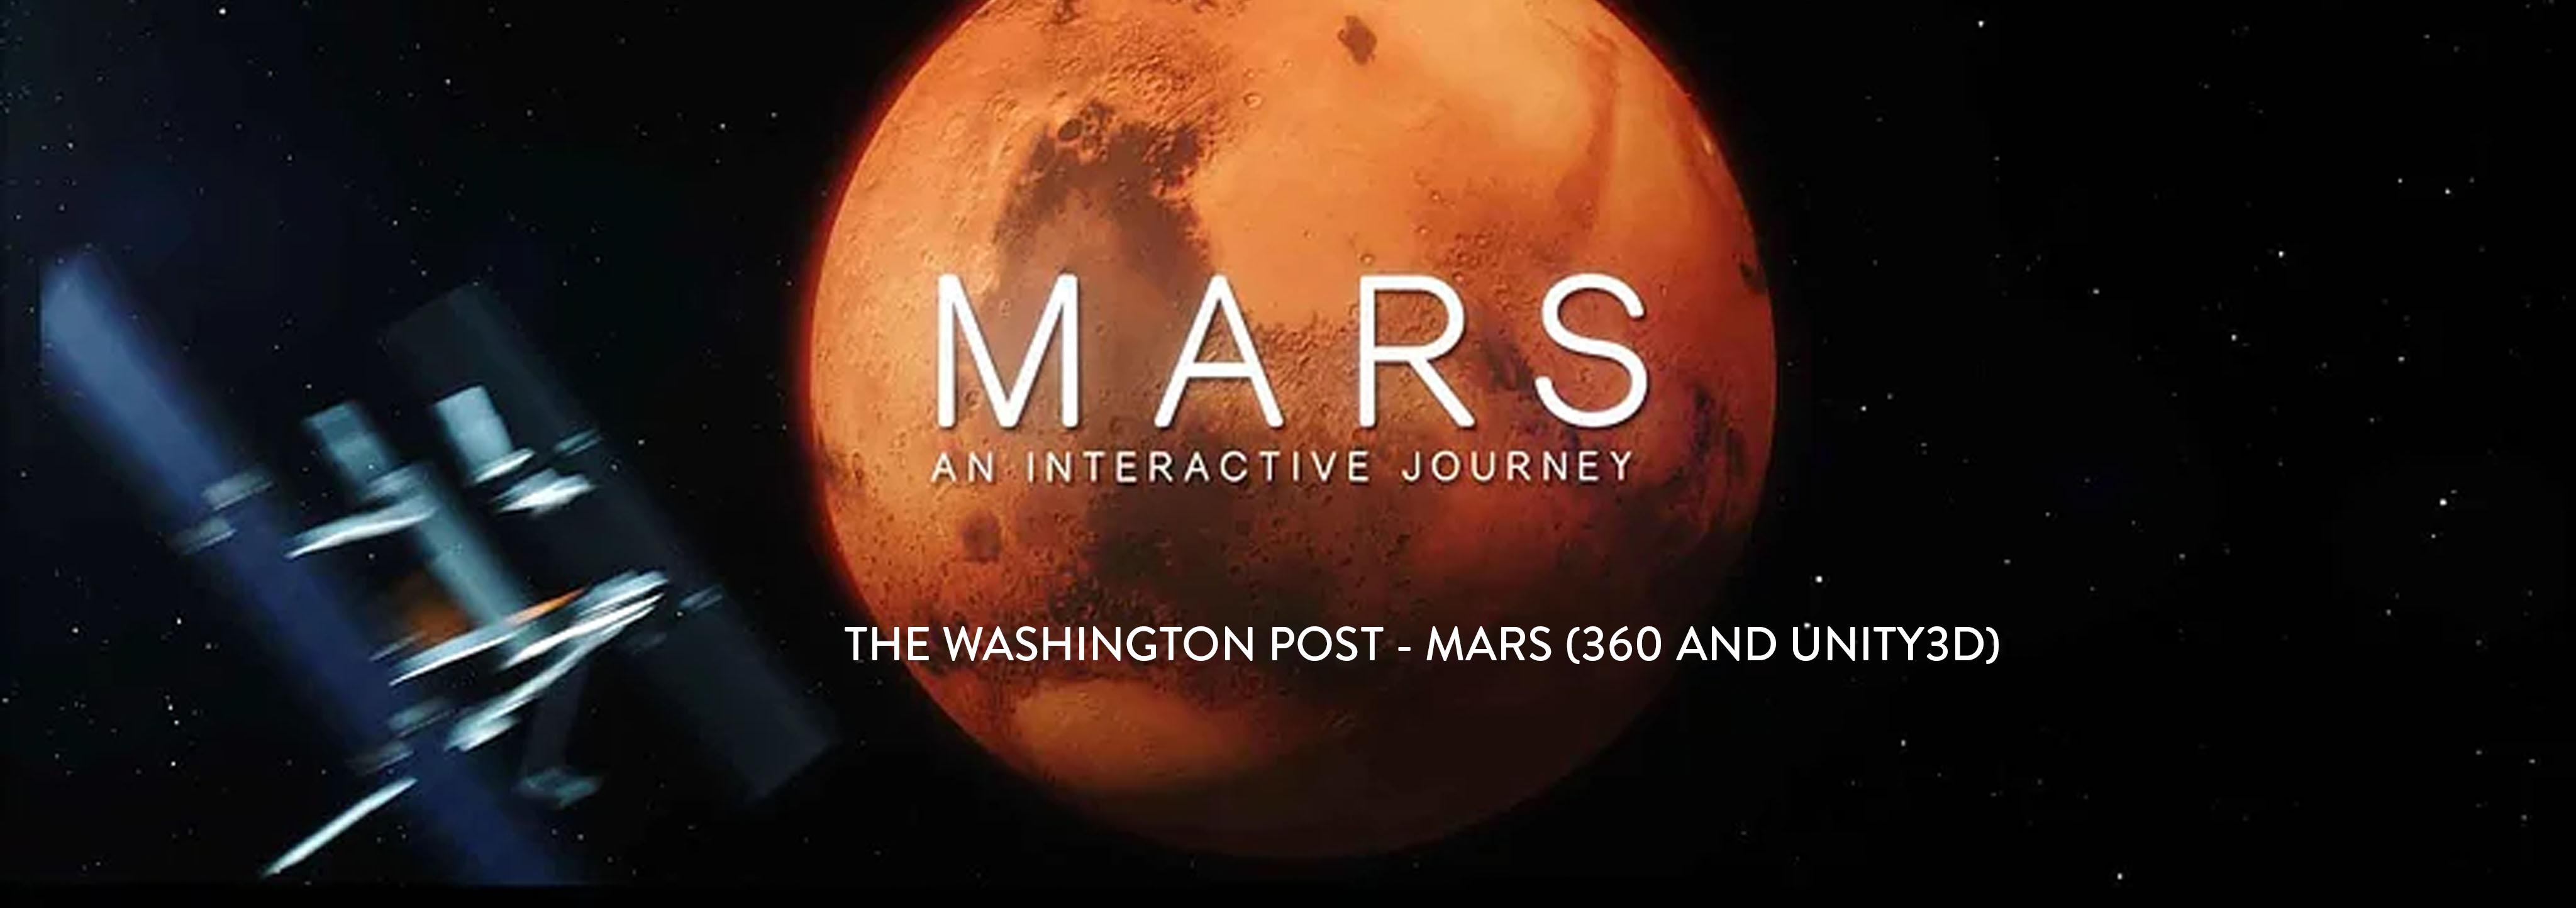 DQ_Splash__0002_THE WASHINGTON POST - MARS (360 AND UNITY3D)